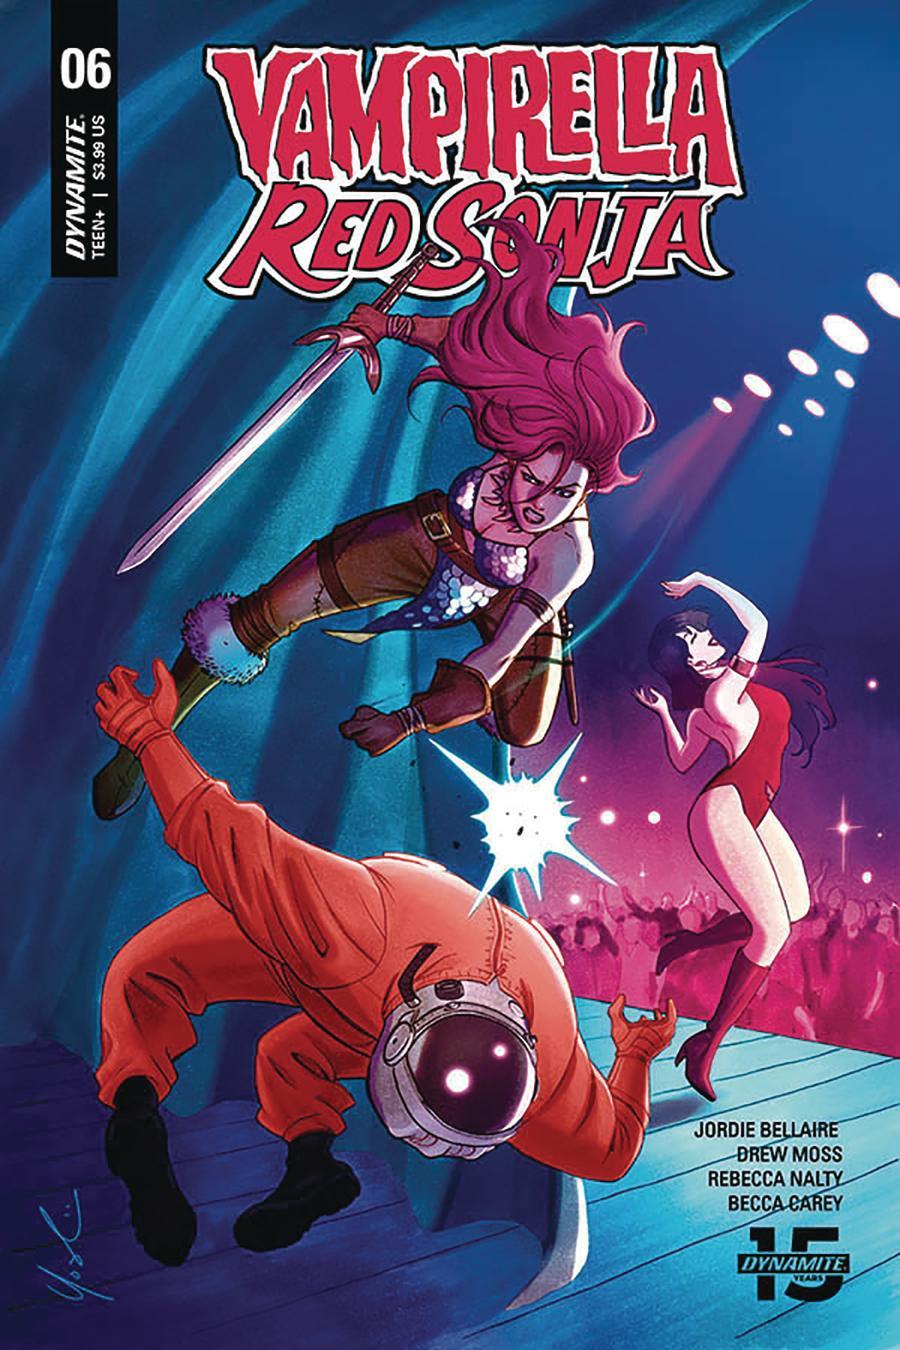 Vampirella Red Sonja #6 Cover D Variant Lynne Yoshii Valentine Cover